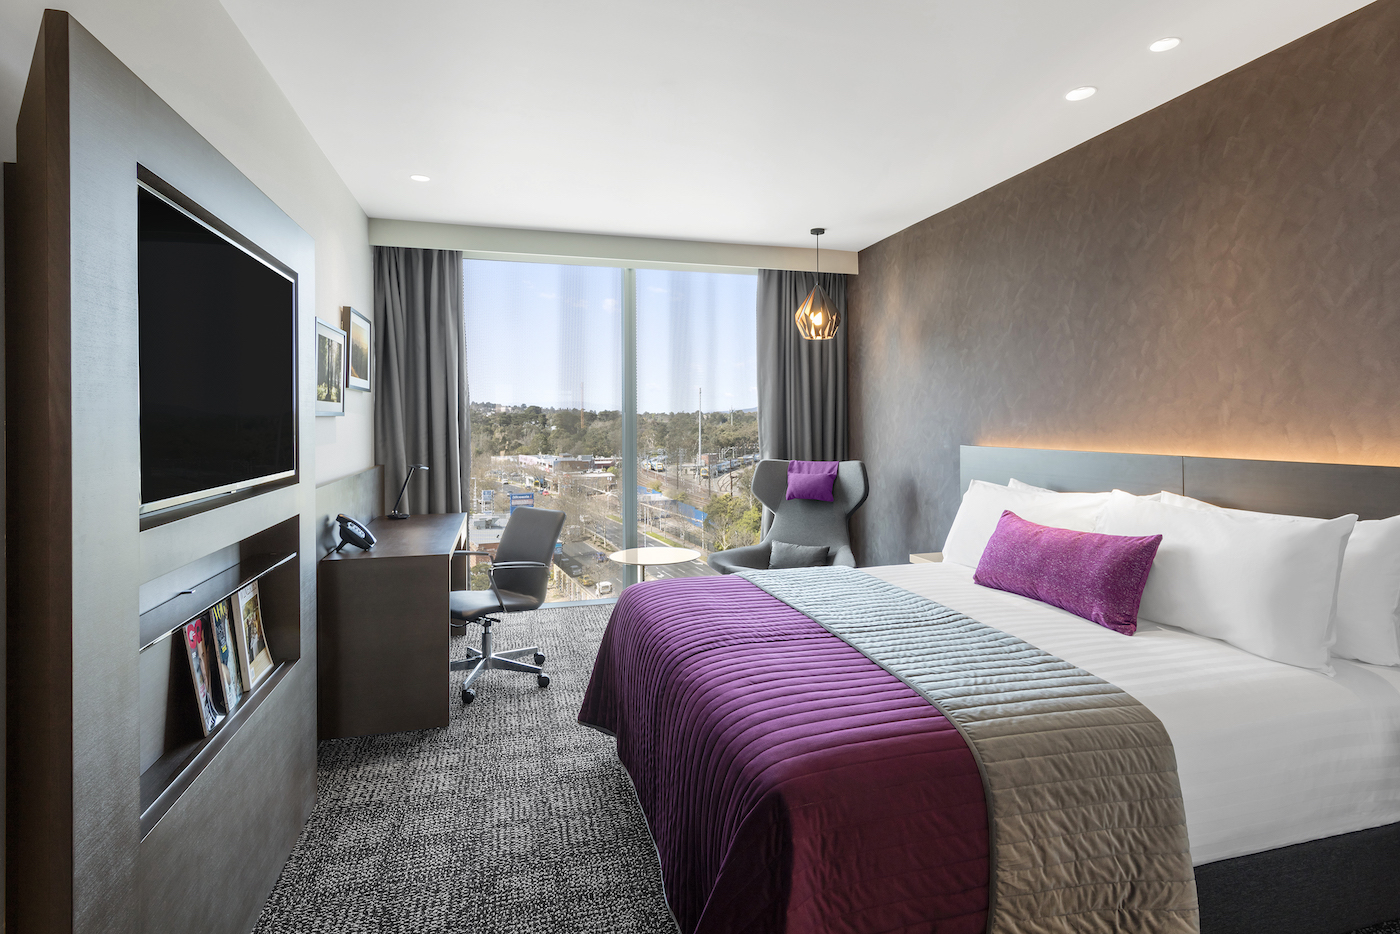 sage-hotel-ringwood-unveil-2017-room.jpg